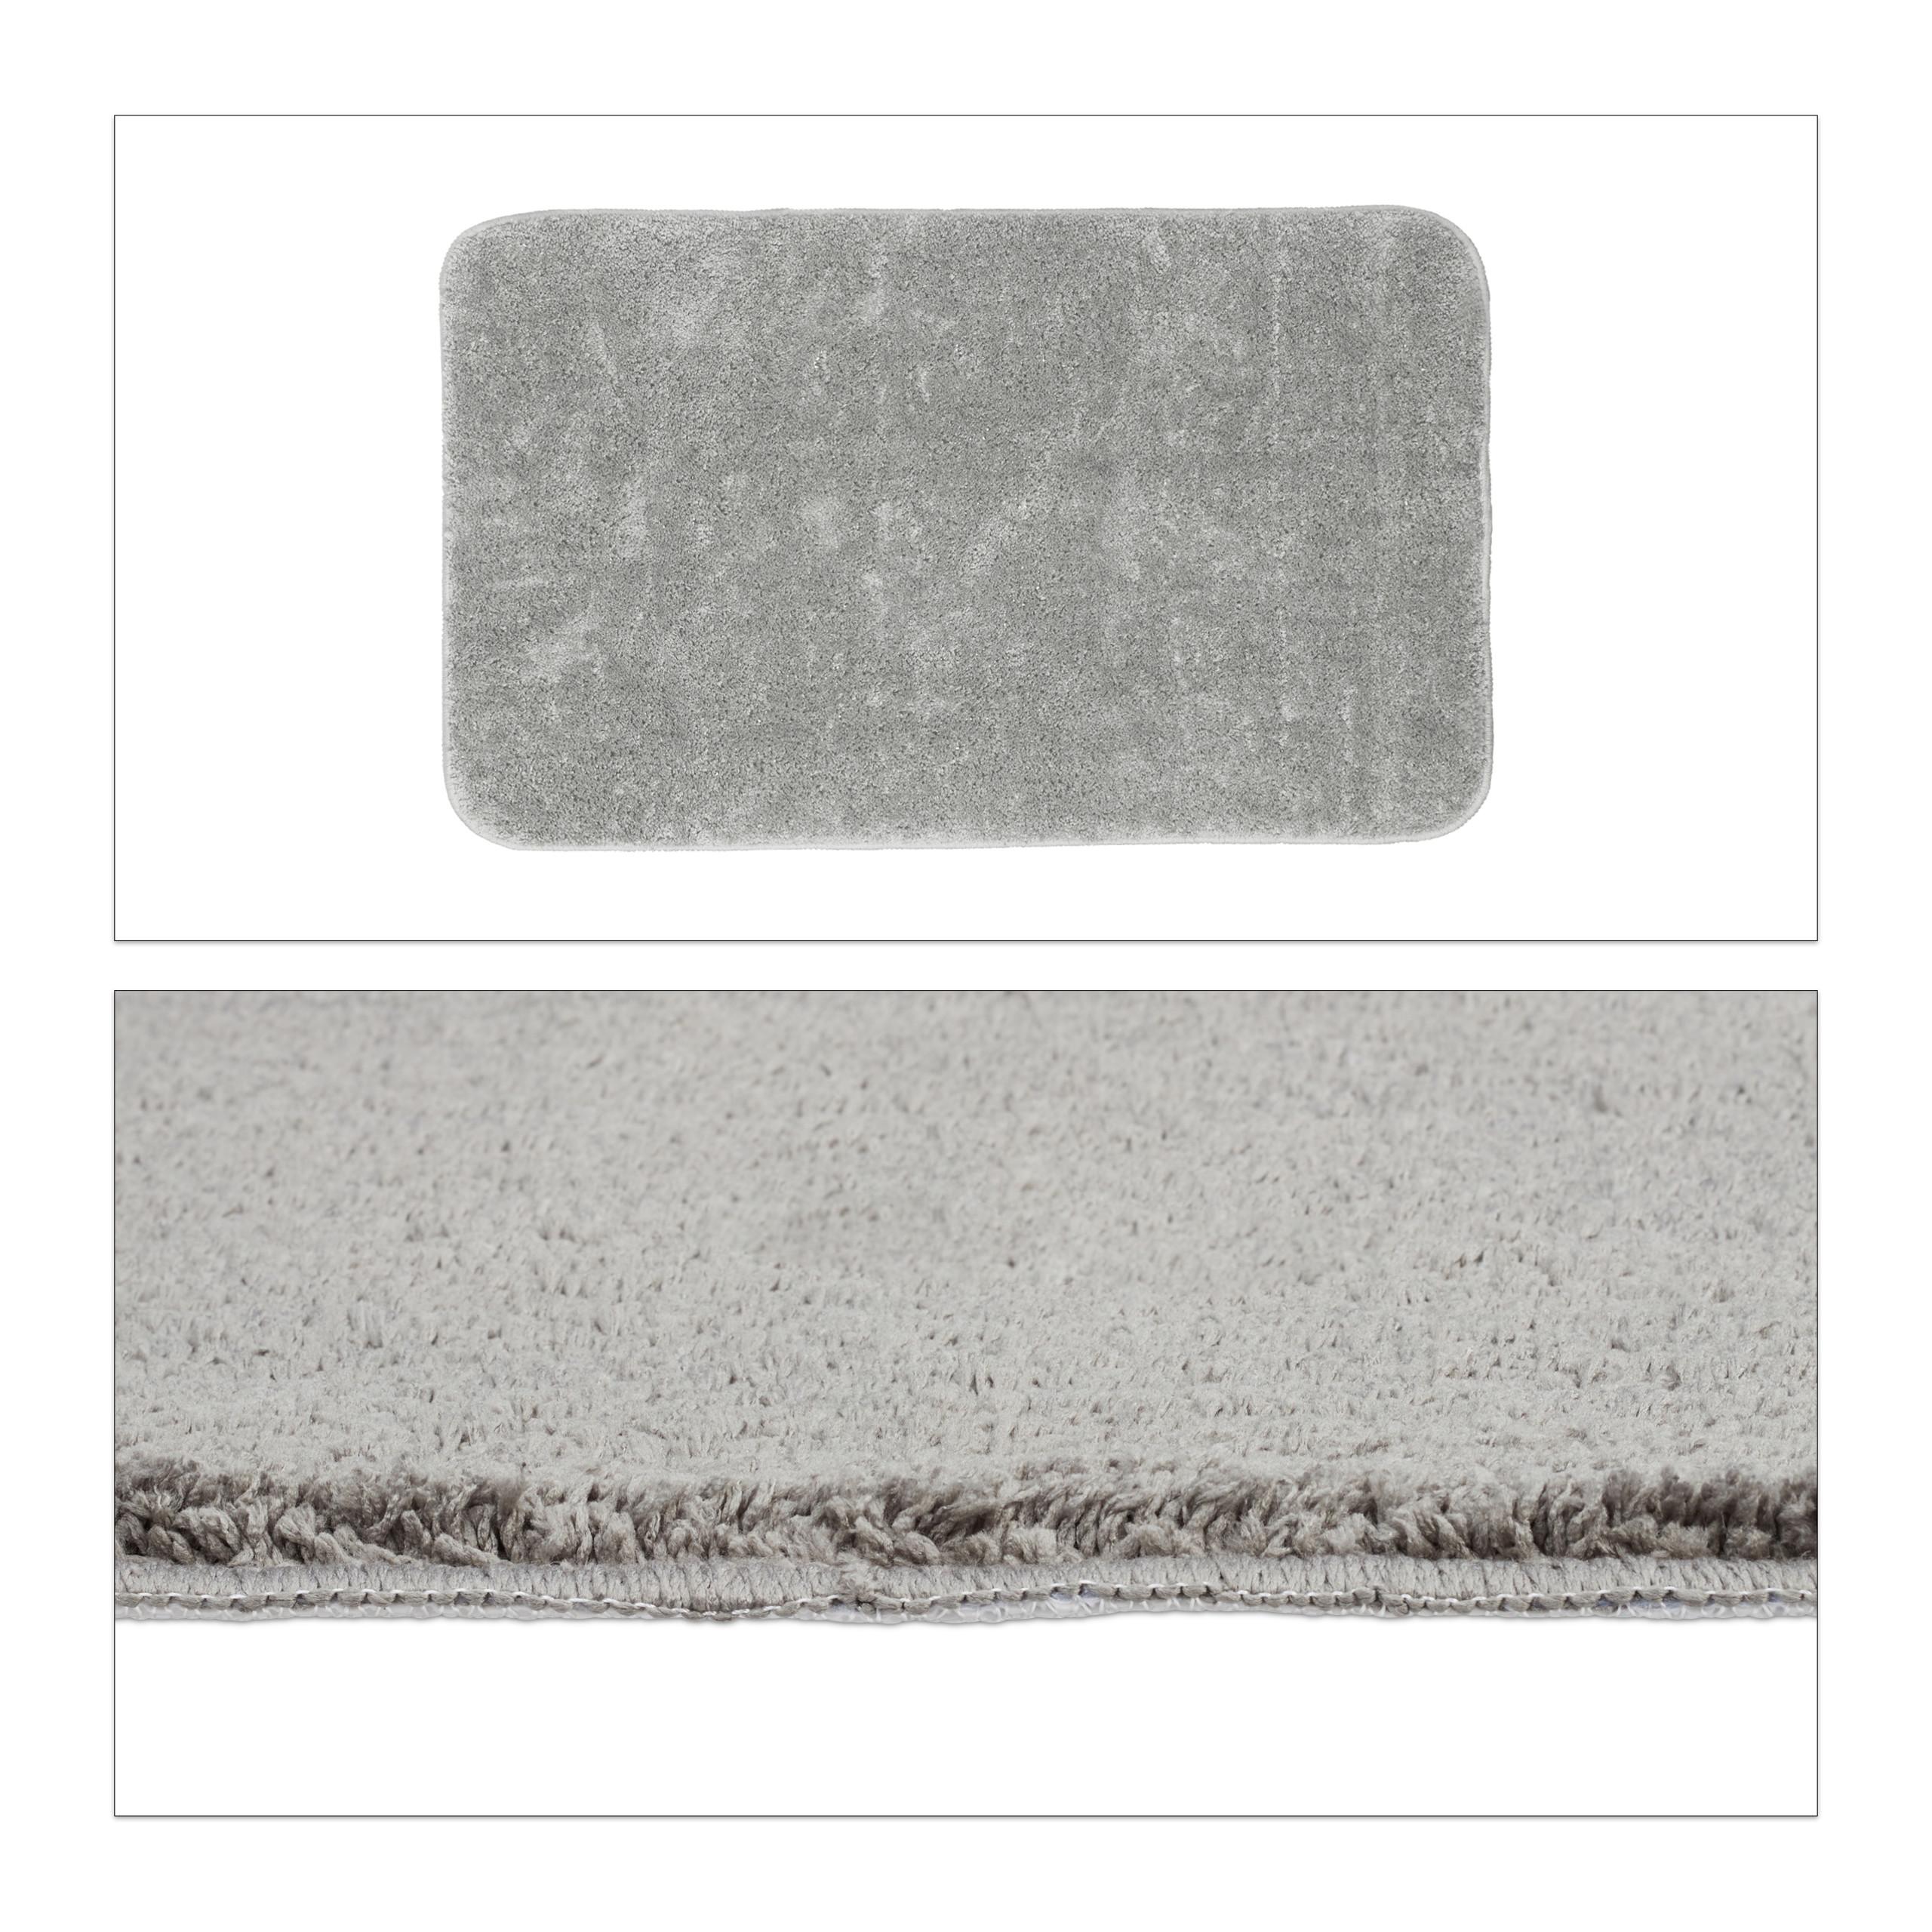 Tapis de bain gris salle de bain tapis antidérapant tapis de bain ...